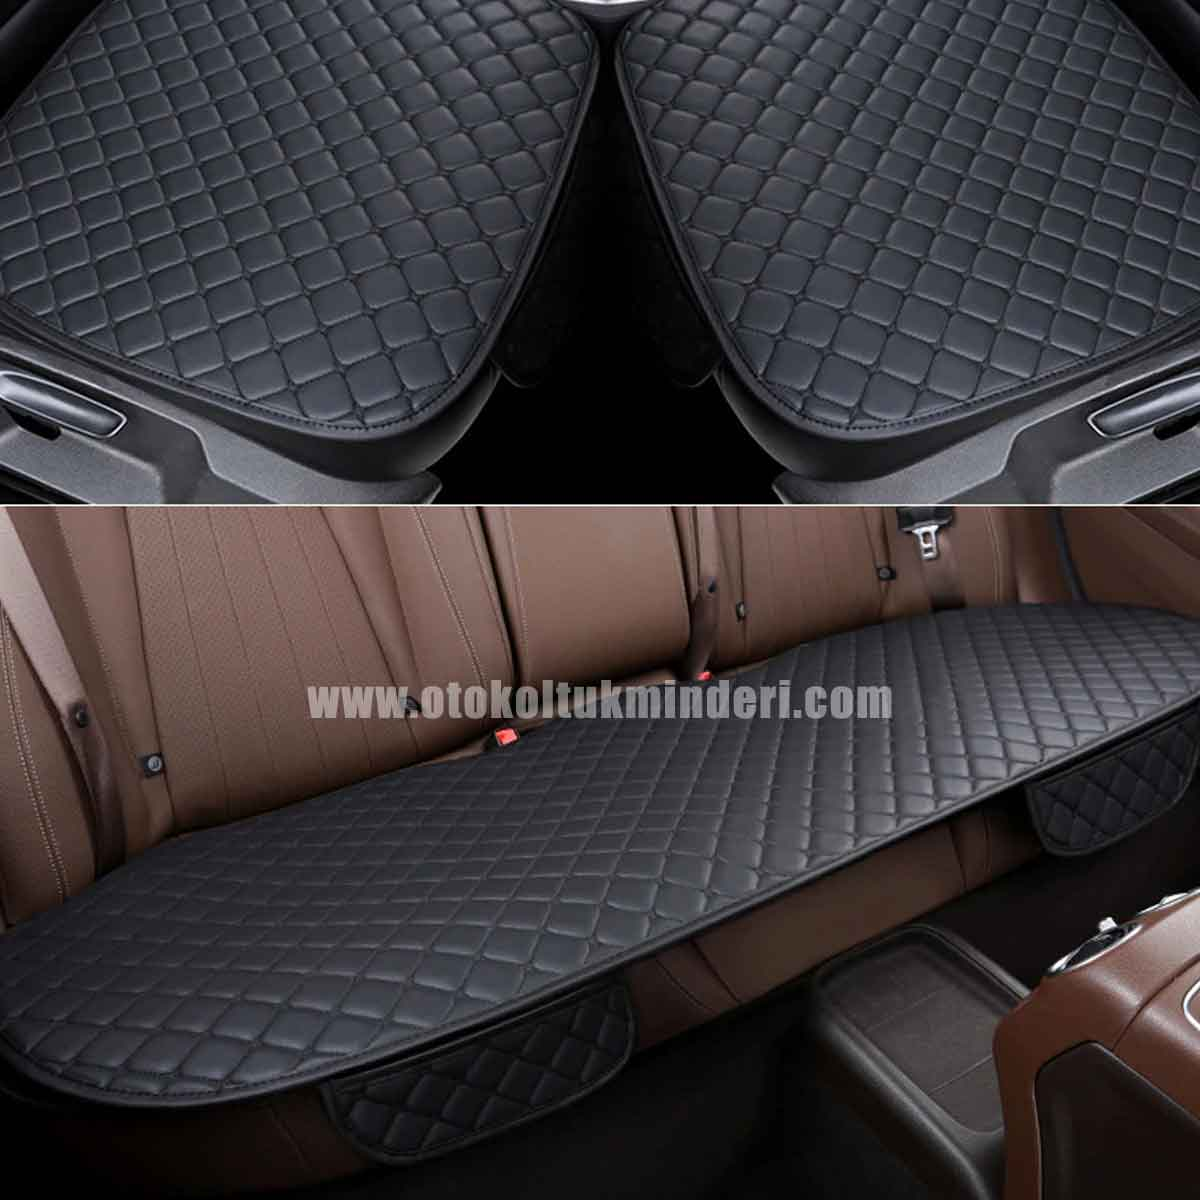 Ssangyong koltuk kılıfı deri - Ssangyong Koltuk minderi Siyah Deri Cepli